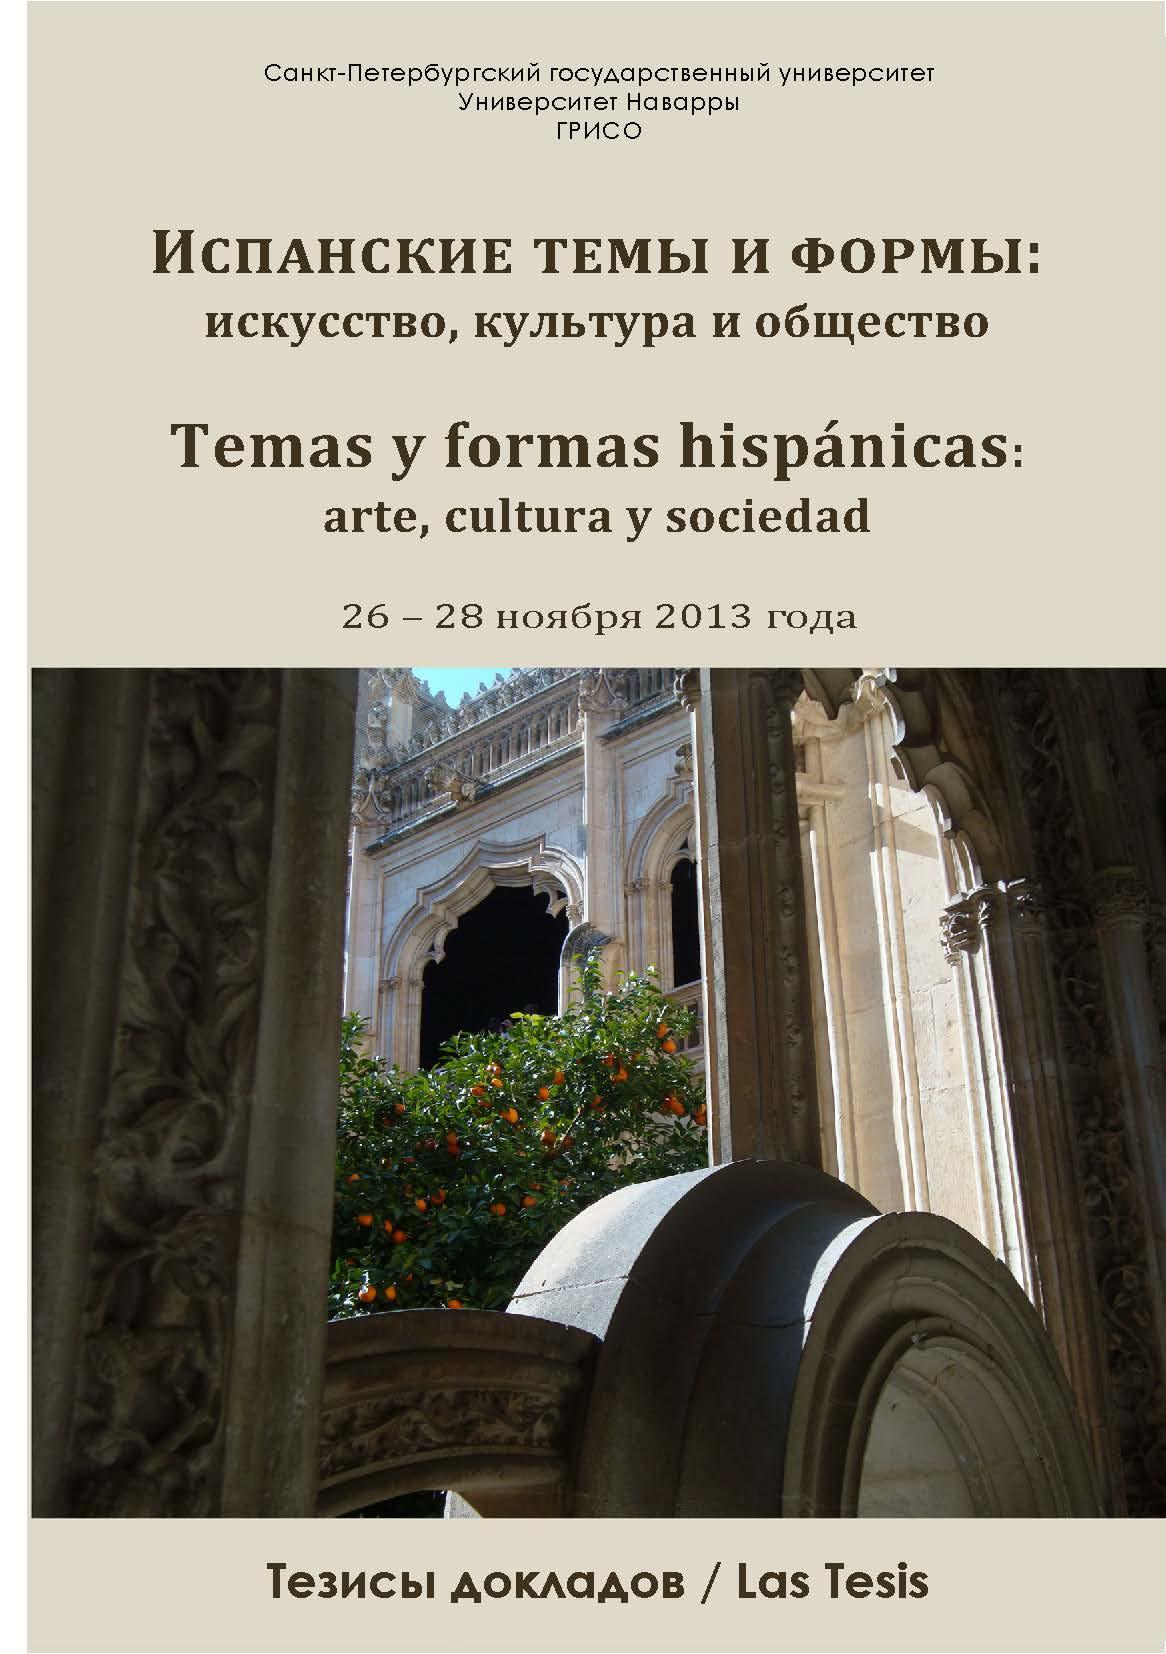 Восток в письмах испанских католических миссионеров в эпоху Филиппа II / The Oriental World in the Reports of the Spanish Catholic Missionaries in the Age of Philip II